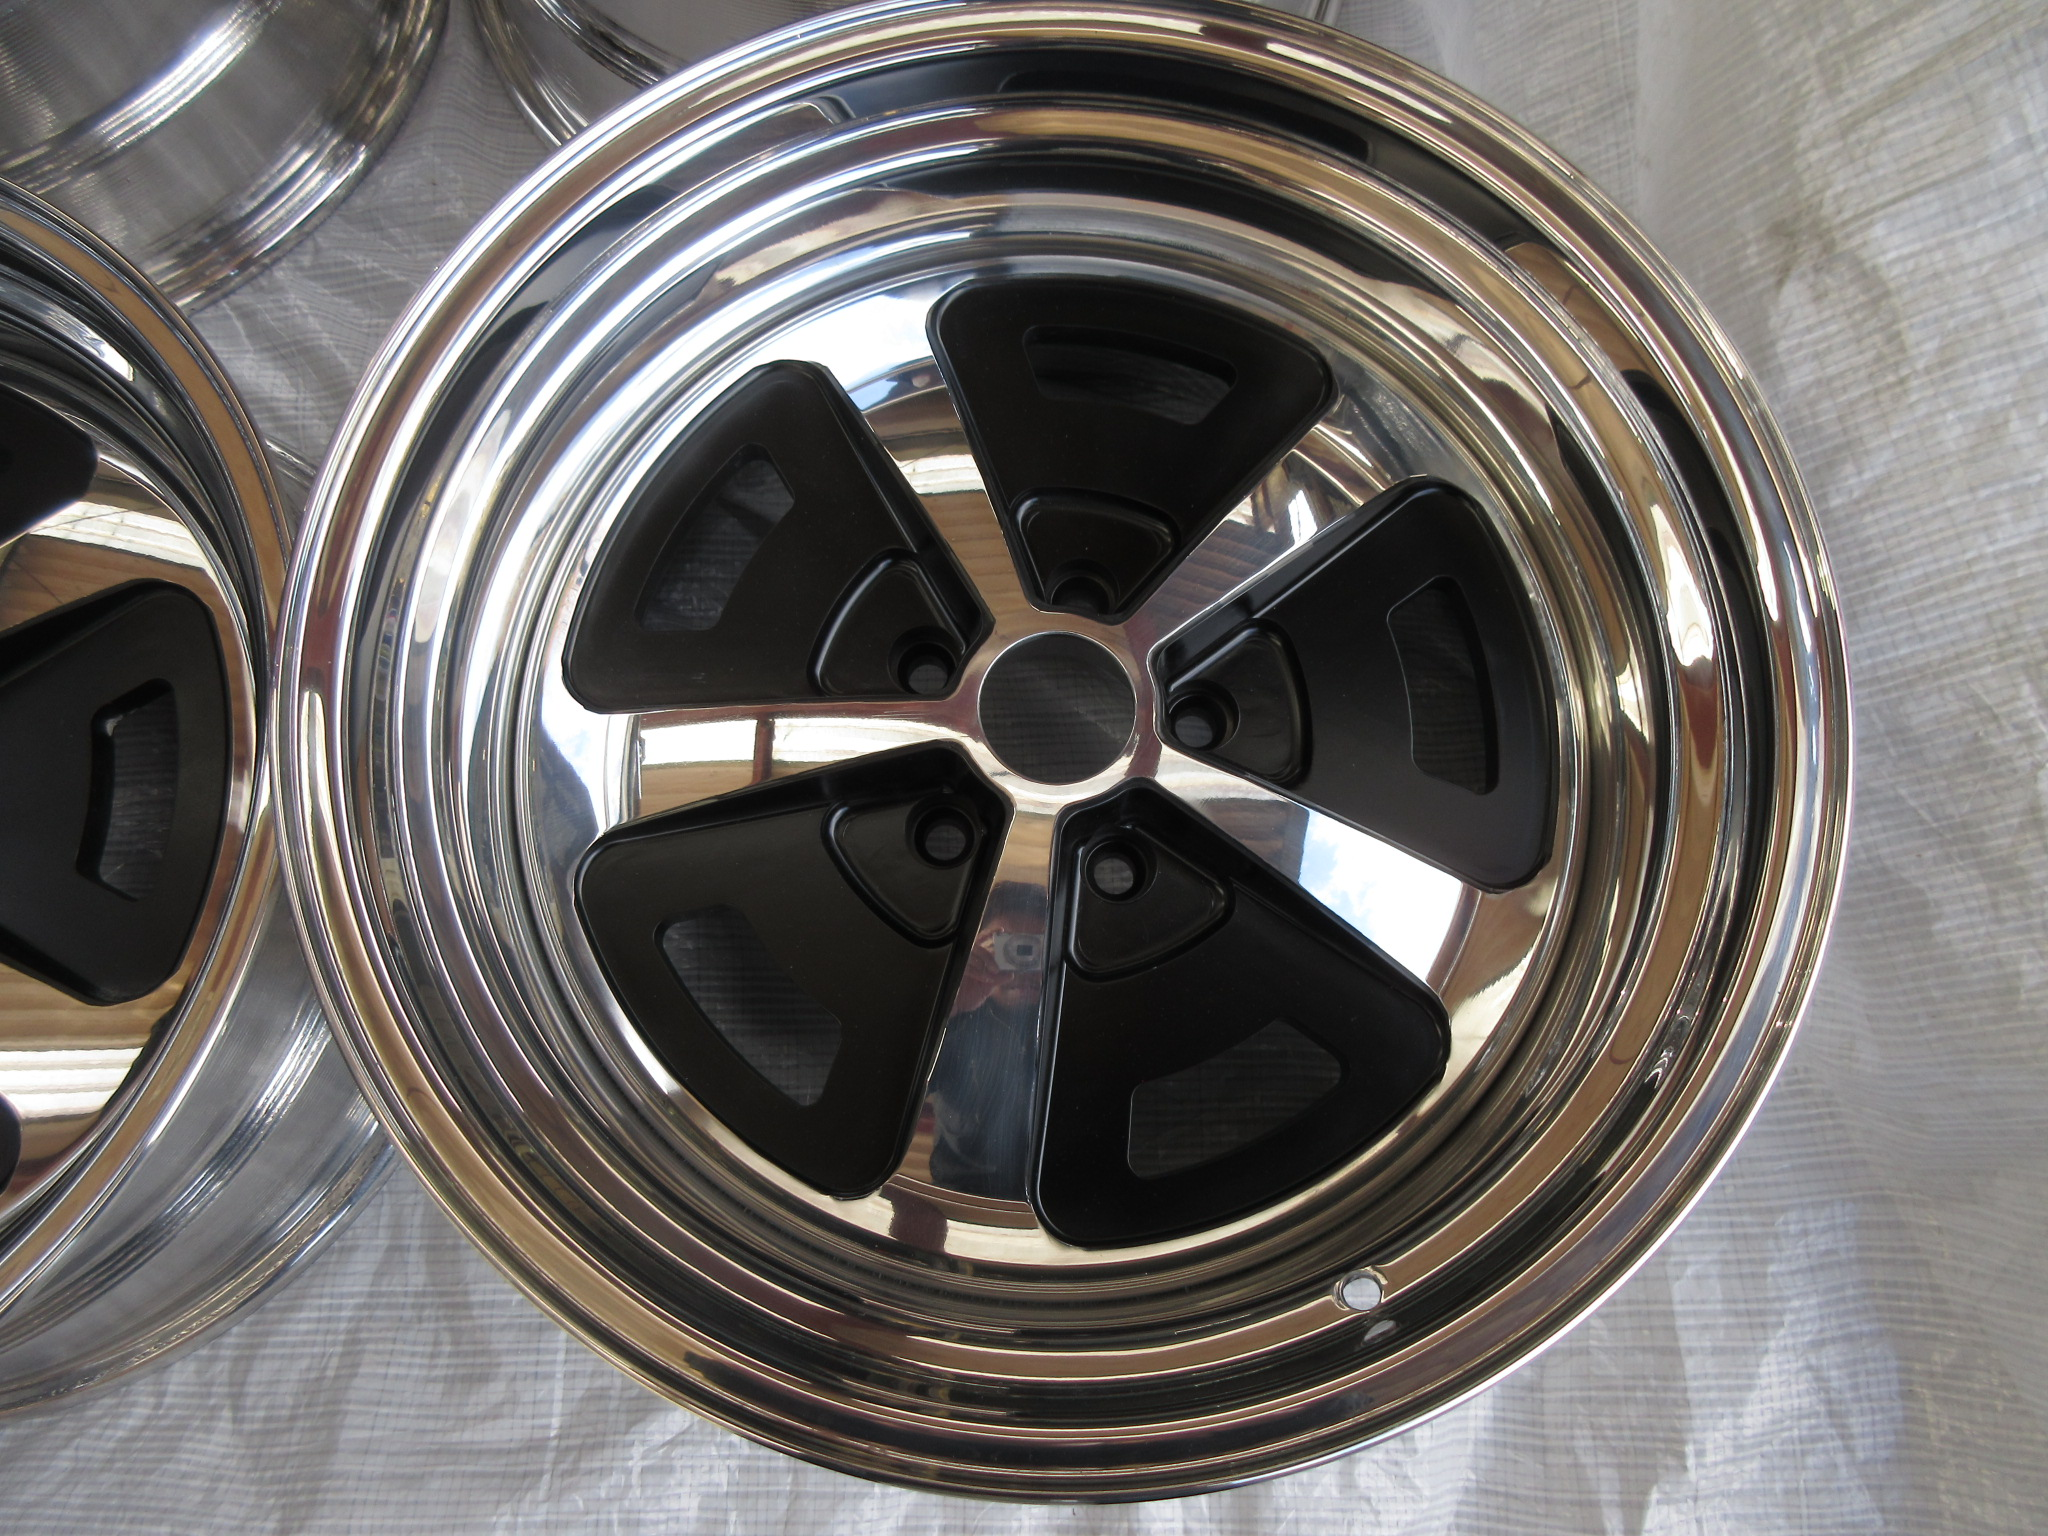 Magnum 500 Wheels >> マグナム 500 ホイール!! BILLET MAGNUM 500 WHEELS! | 創業40年 群馬のアメリカ車&クラシックカー専門店 トミザワモータースのブログ